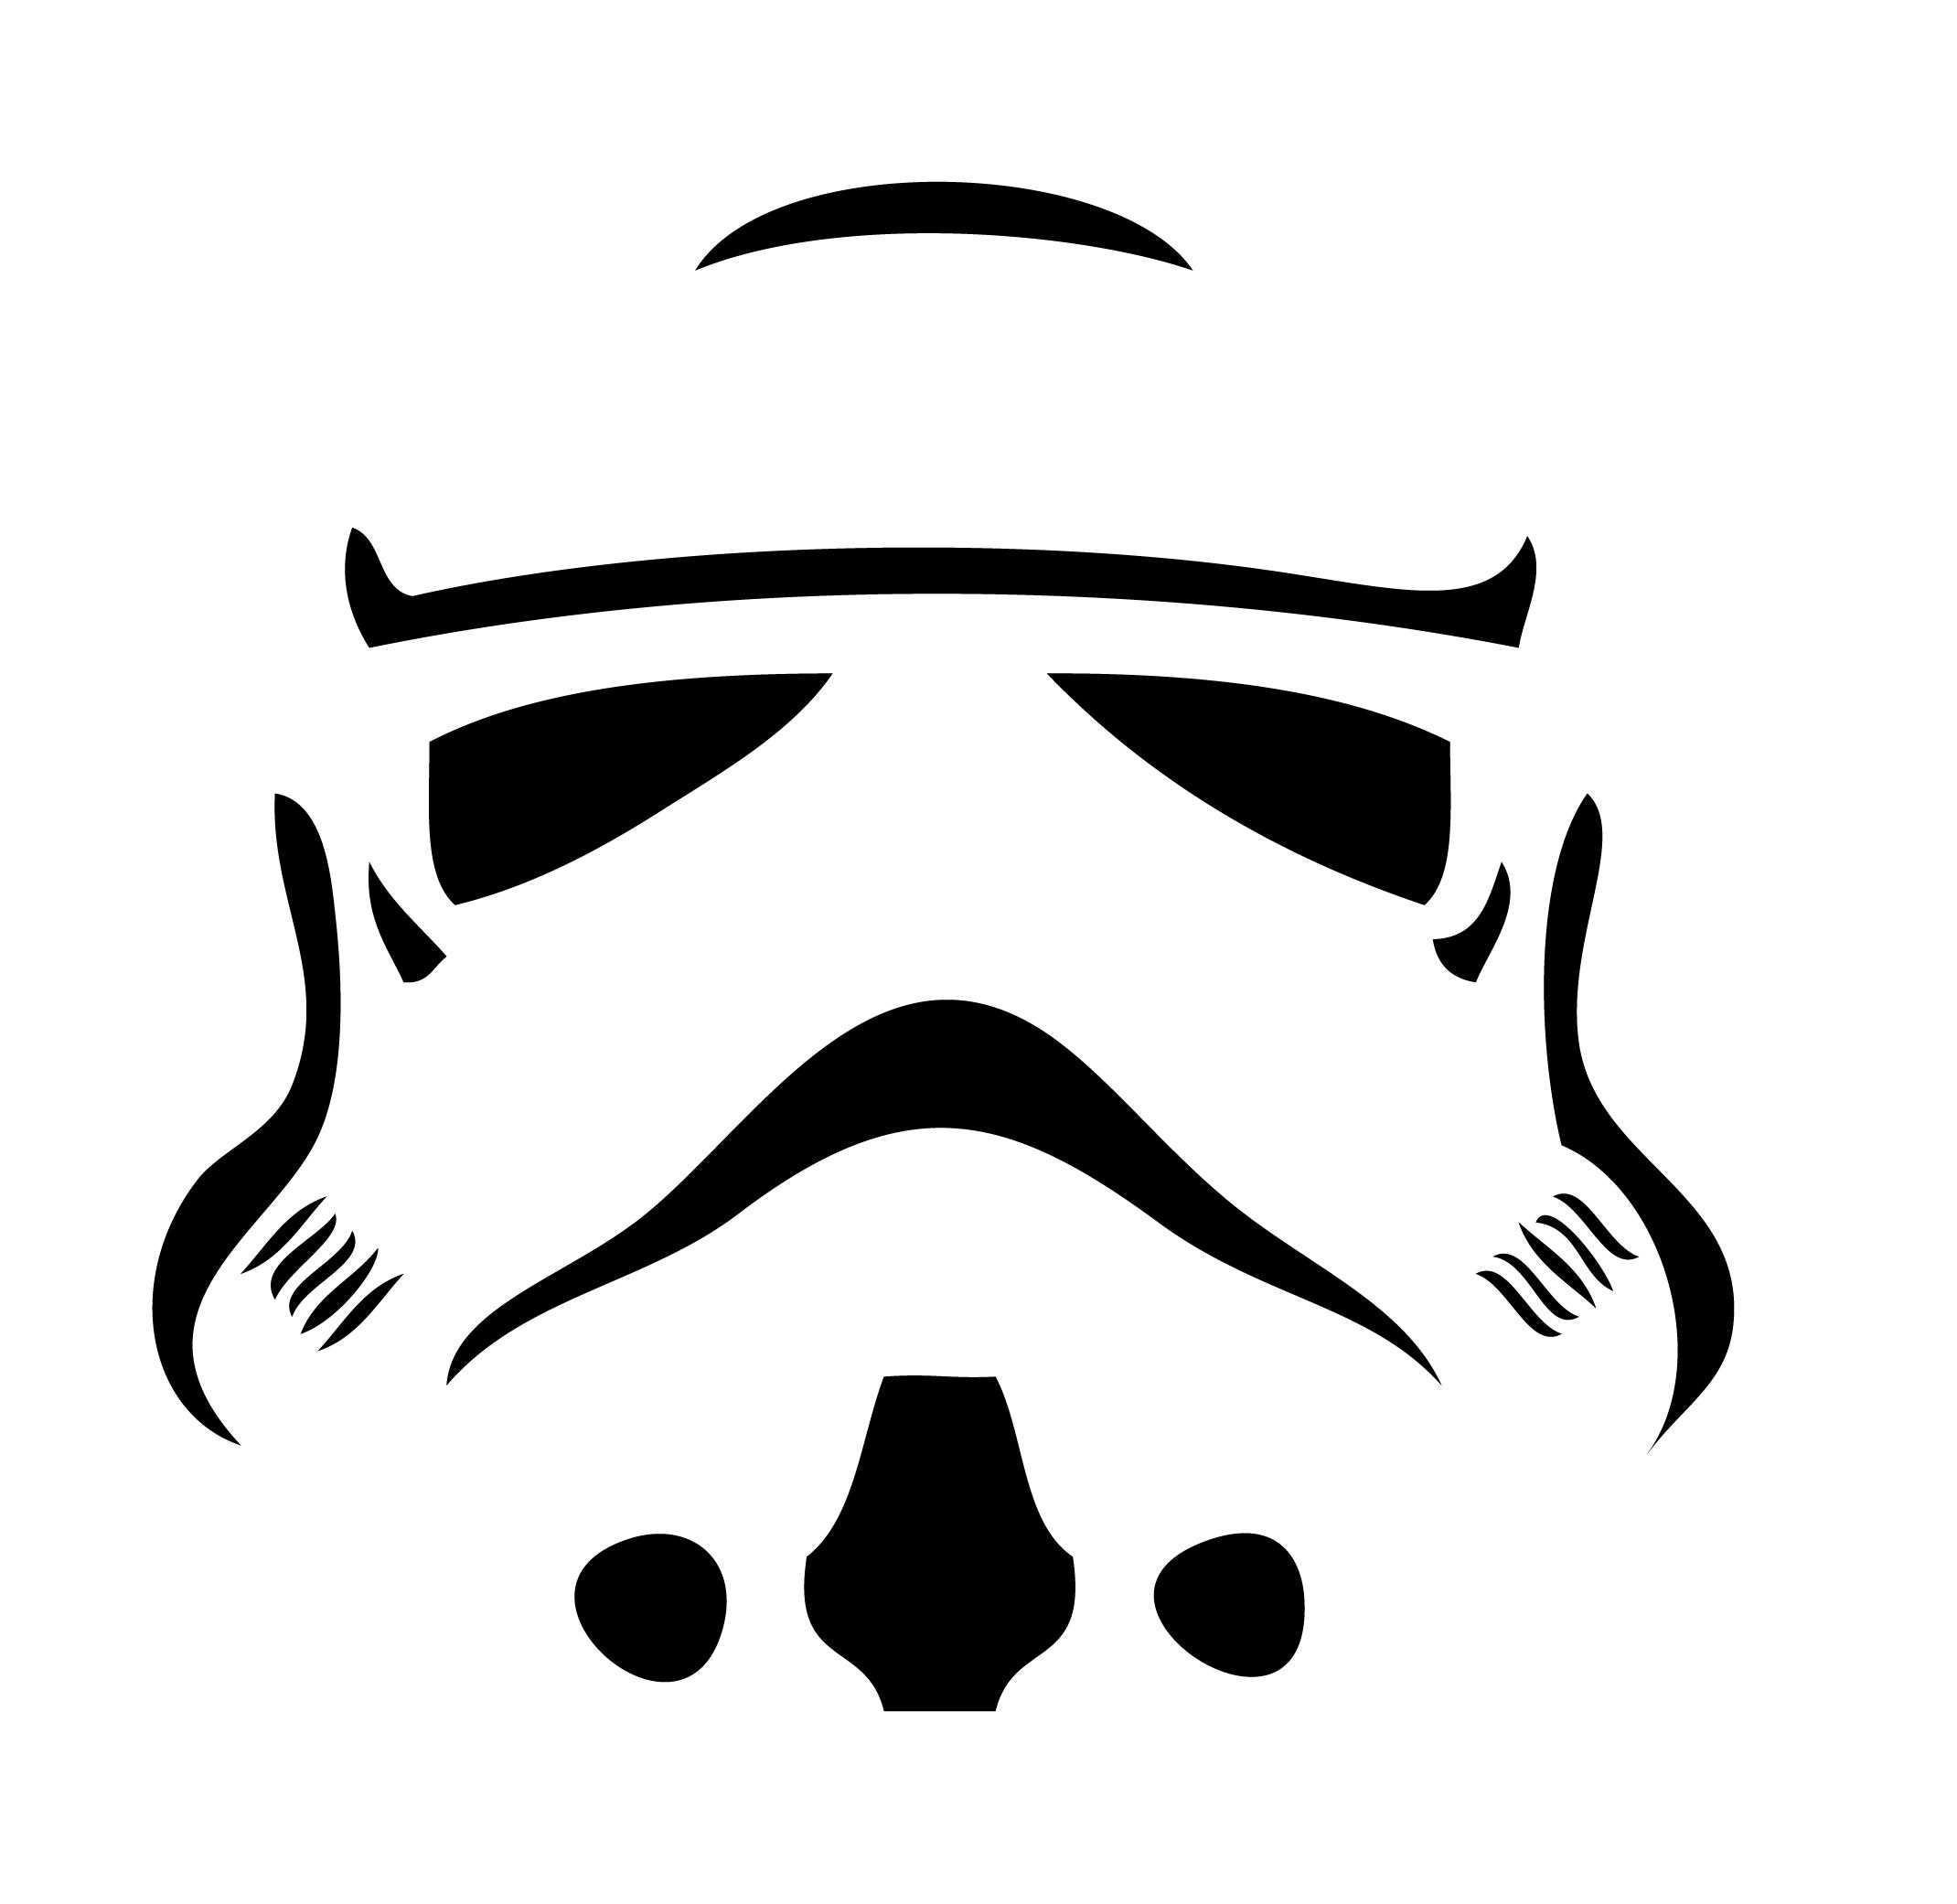 Darth Vader Clipart Pumpkin Carving Templates Picture 2587728 Darth Vader Clipart Pumpkin Carving Templates